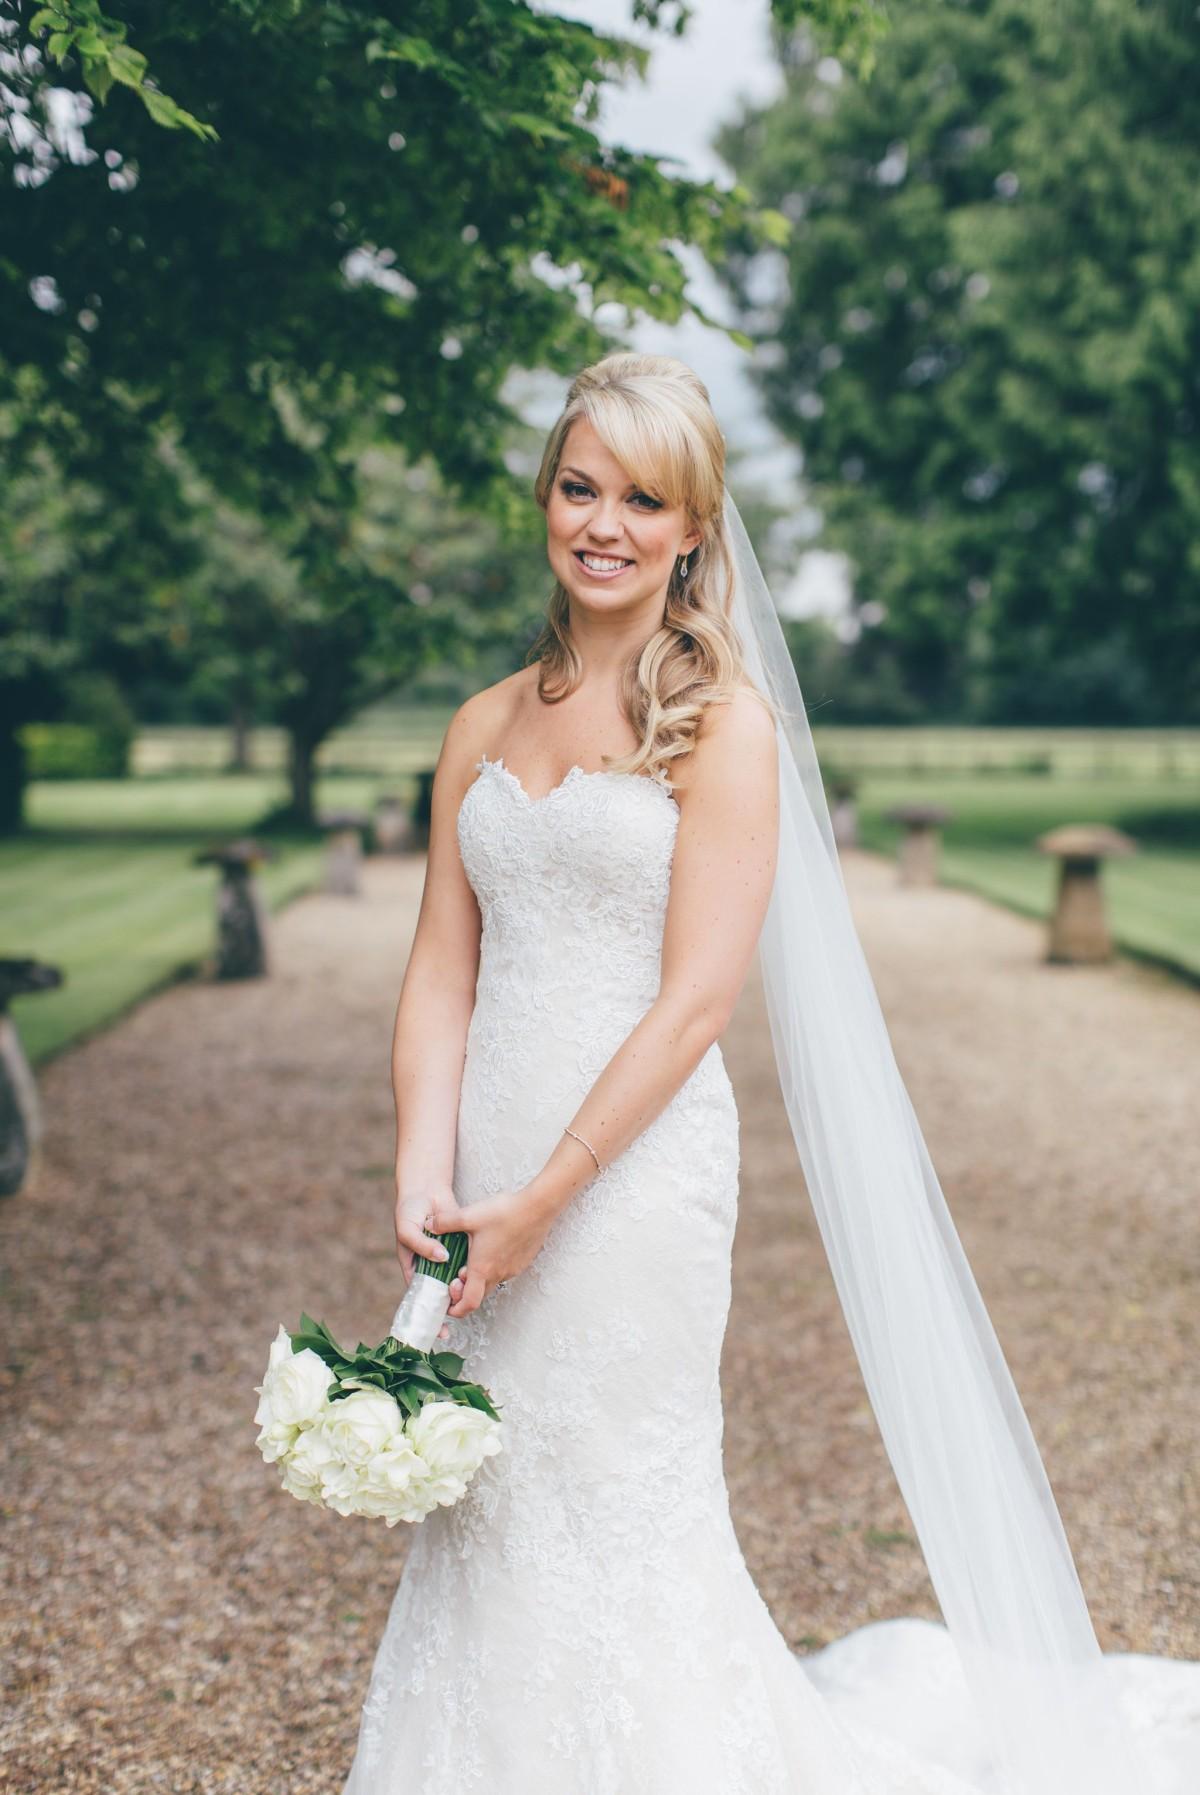 welsh_wedding_photographer_rachel_lambert_photography_lower_slaughter_manor_house_cotswolds_harriet_dean_ 36